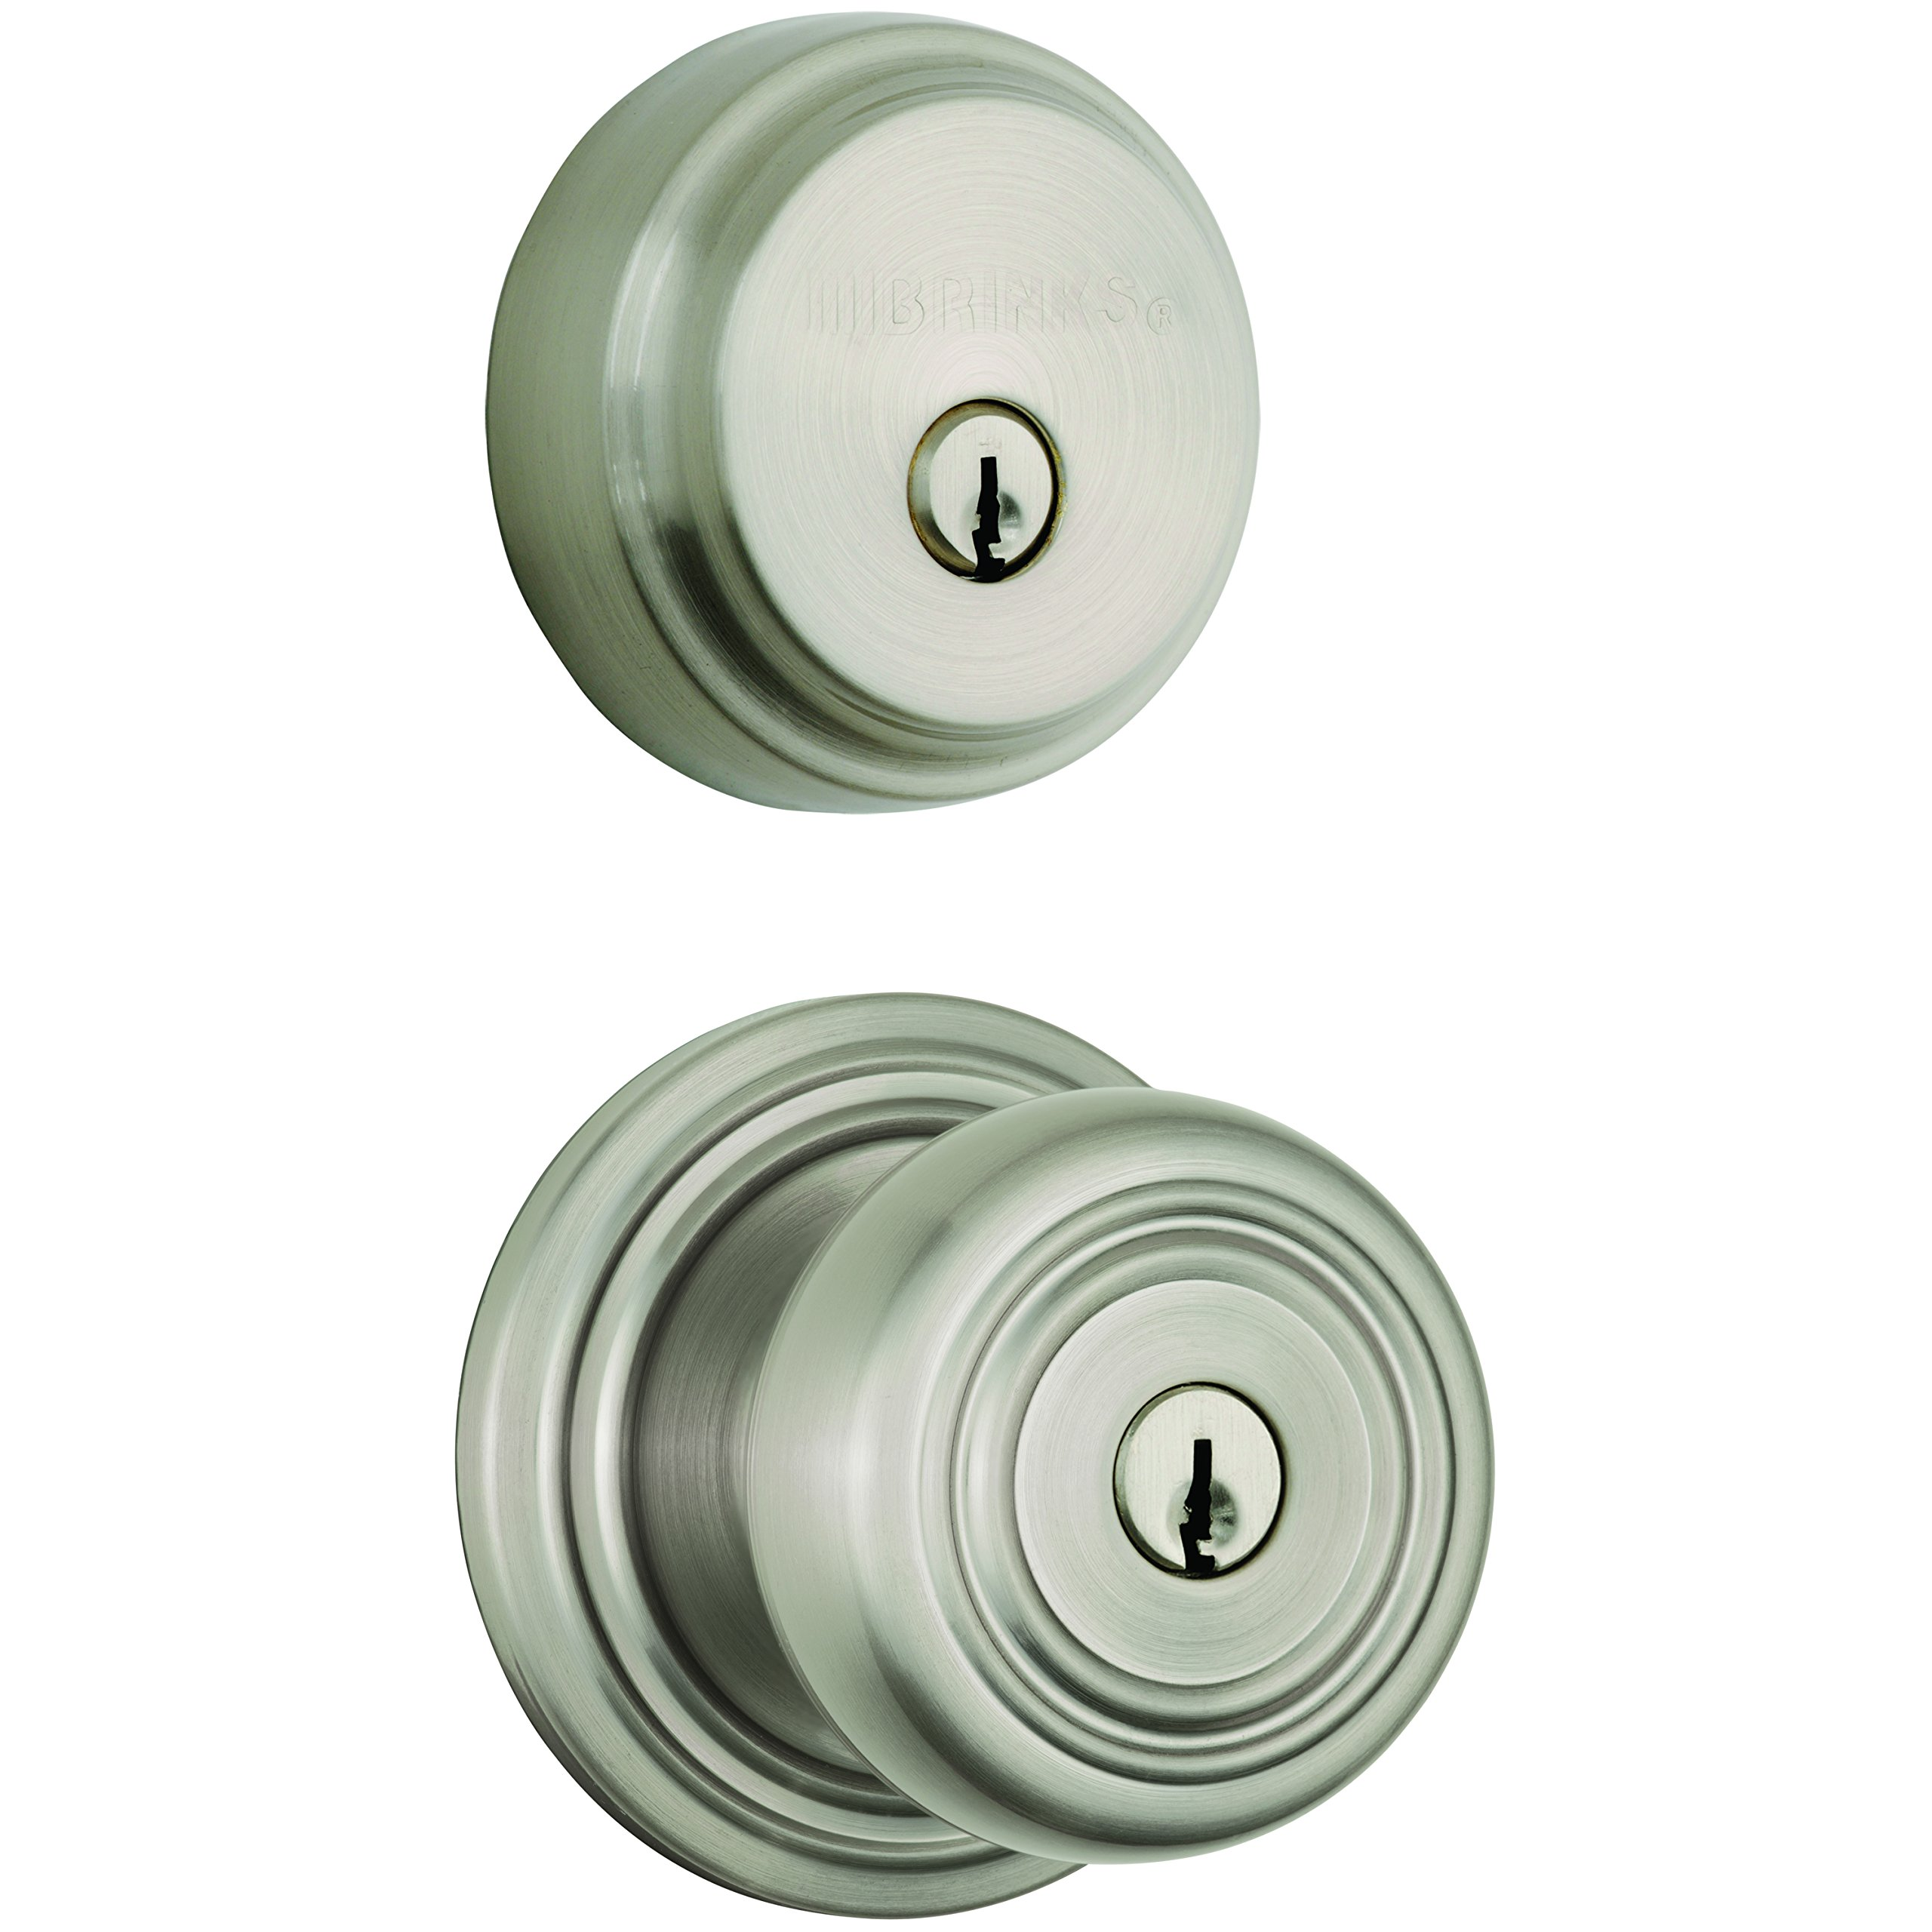 Brinks Push Pull Rotate Door Locks Webley Combination Pack with Entry Knob and Deadbolt, Satin Nickel, 23084-119